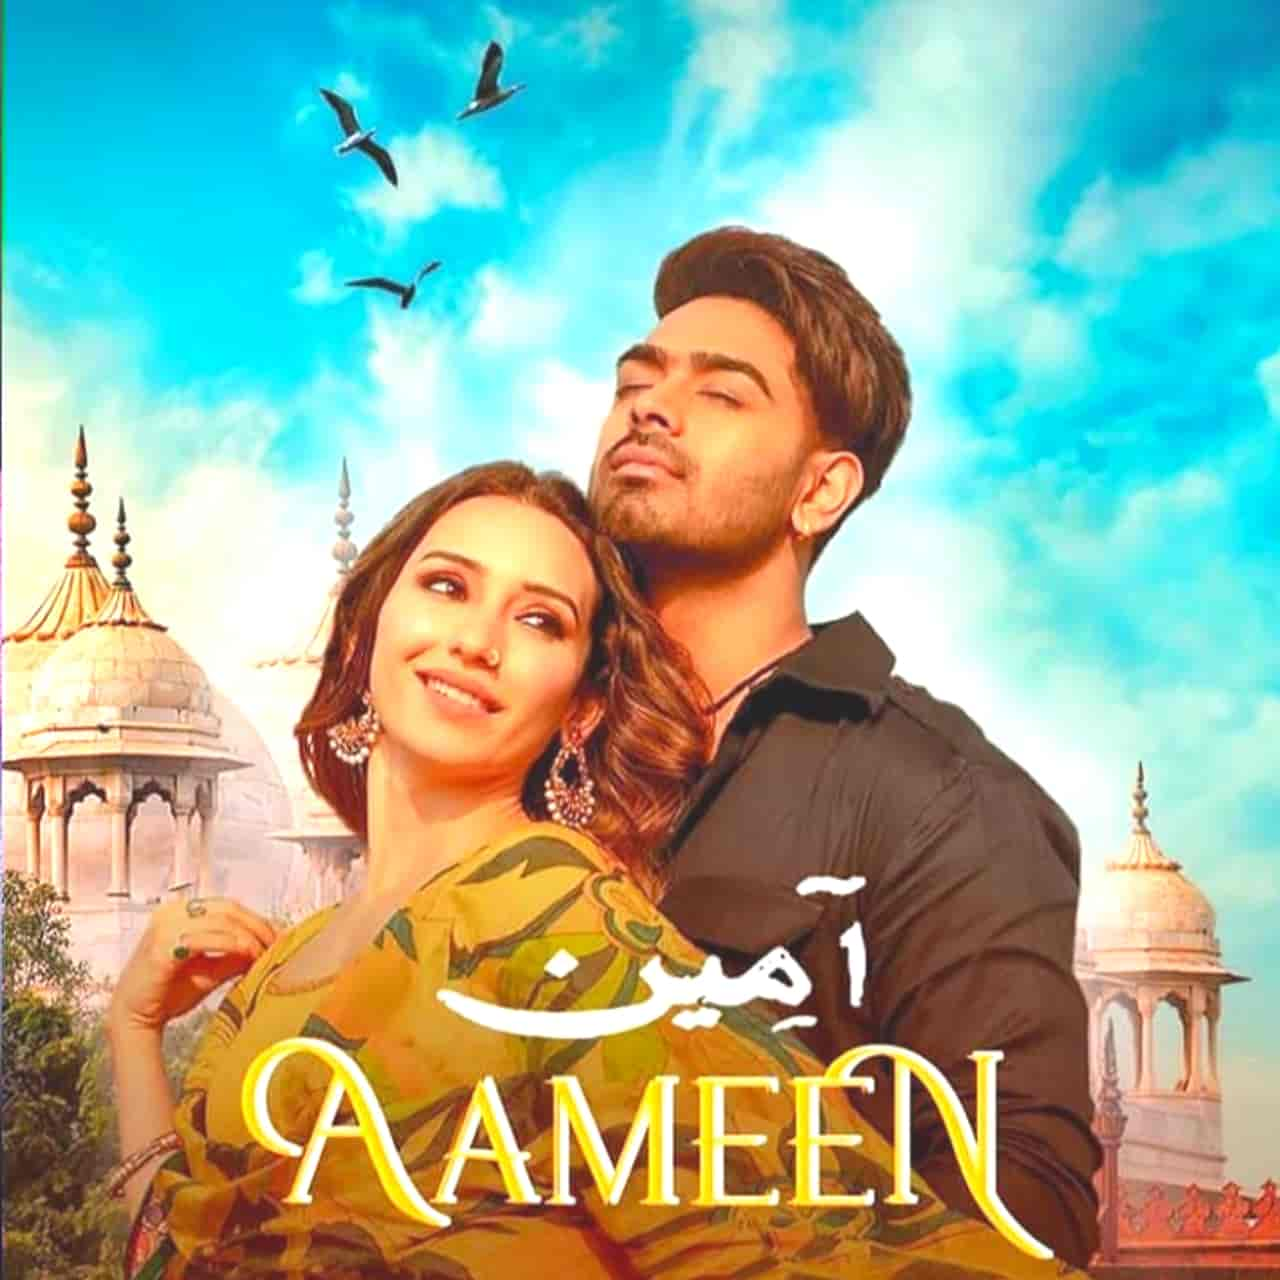 Aameen Song Image By Karan Sehmbi